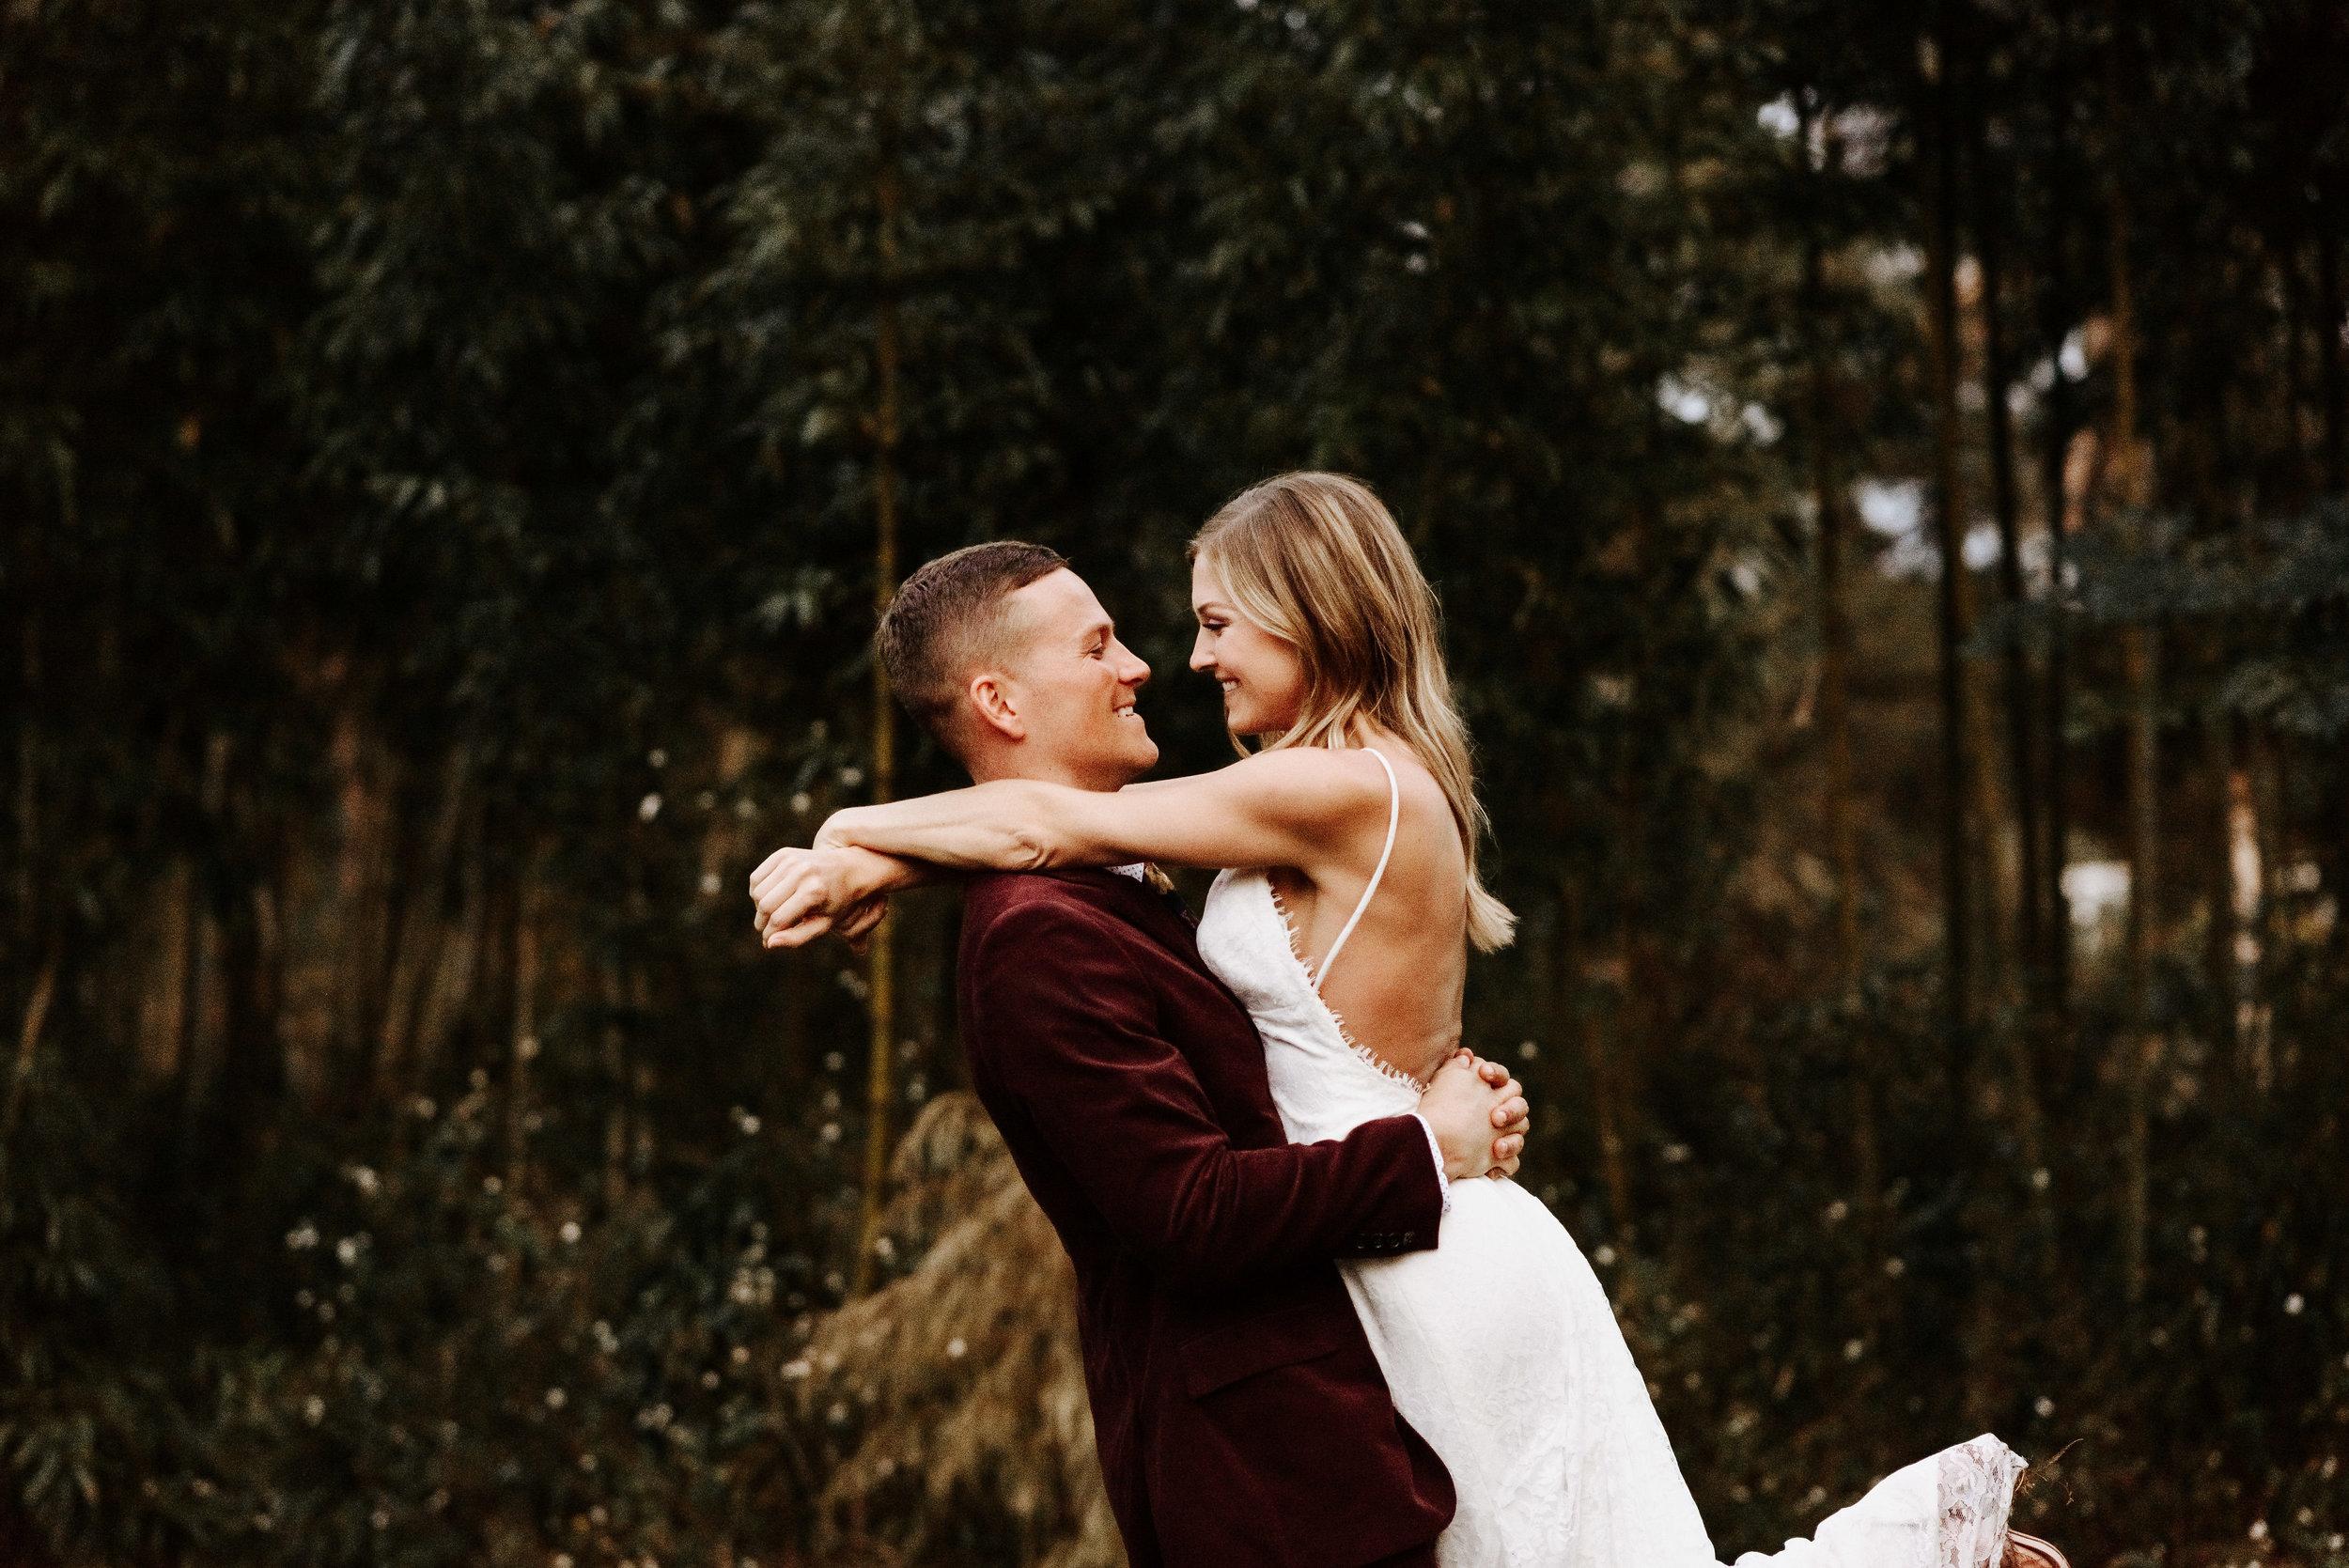 Kourtney_Sean_Savannah_Georgia_Wedding_Wormsloe_Histroic_Site_Coastal_Georgia_Botanical_Gardens_Photography_by_V_7285.jpg